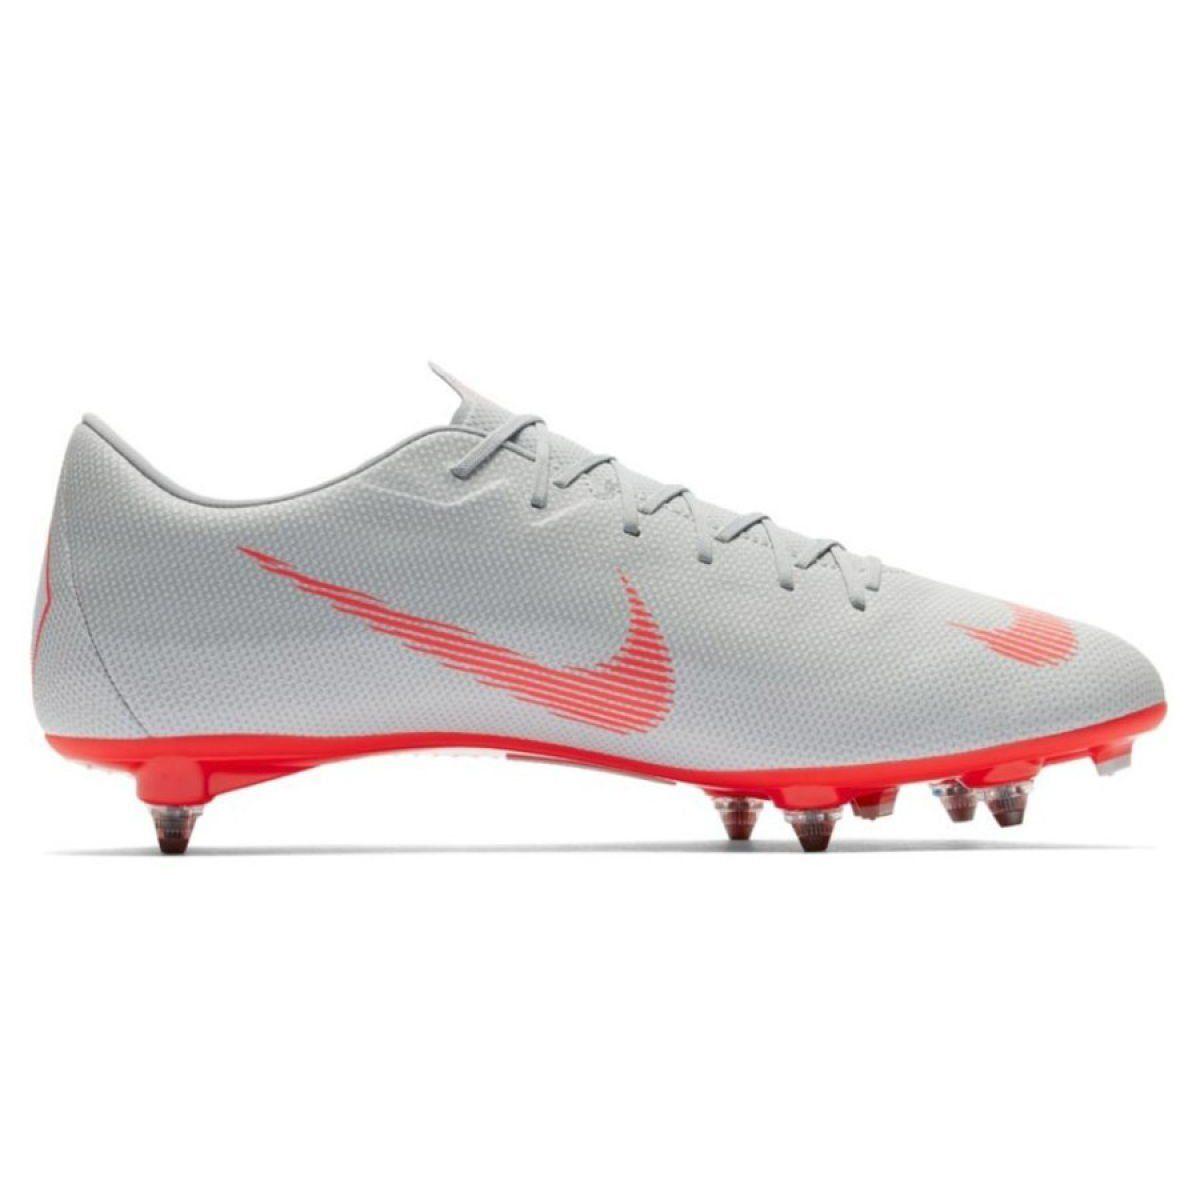 Buty Pilkarskie Nike Mercurial Vapor 12 Academy Sg Pro M Ah7376 060 Szare Wielokolorowe